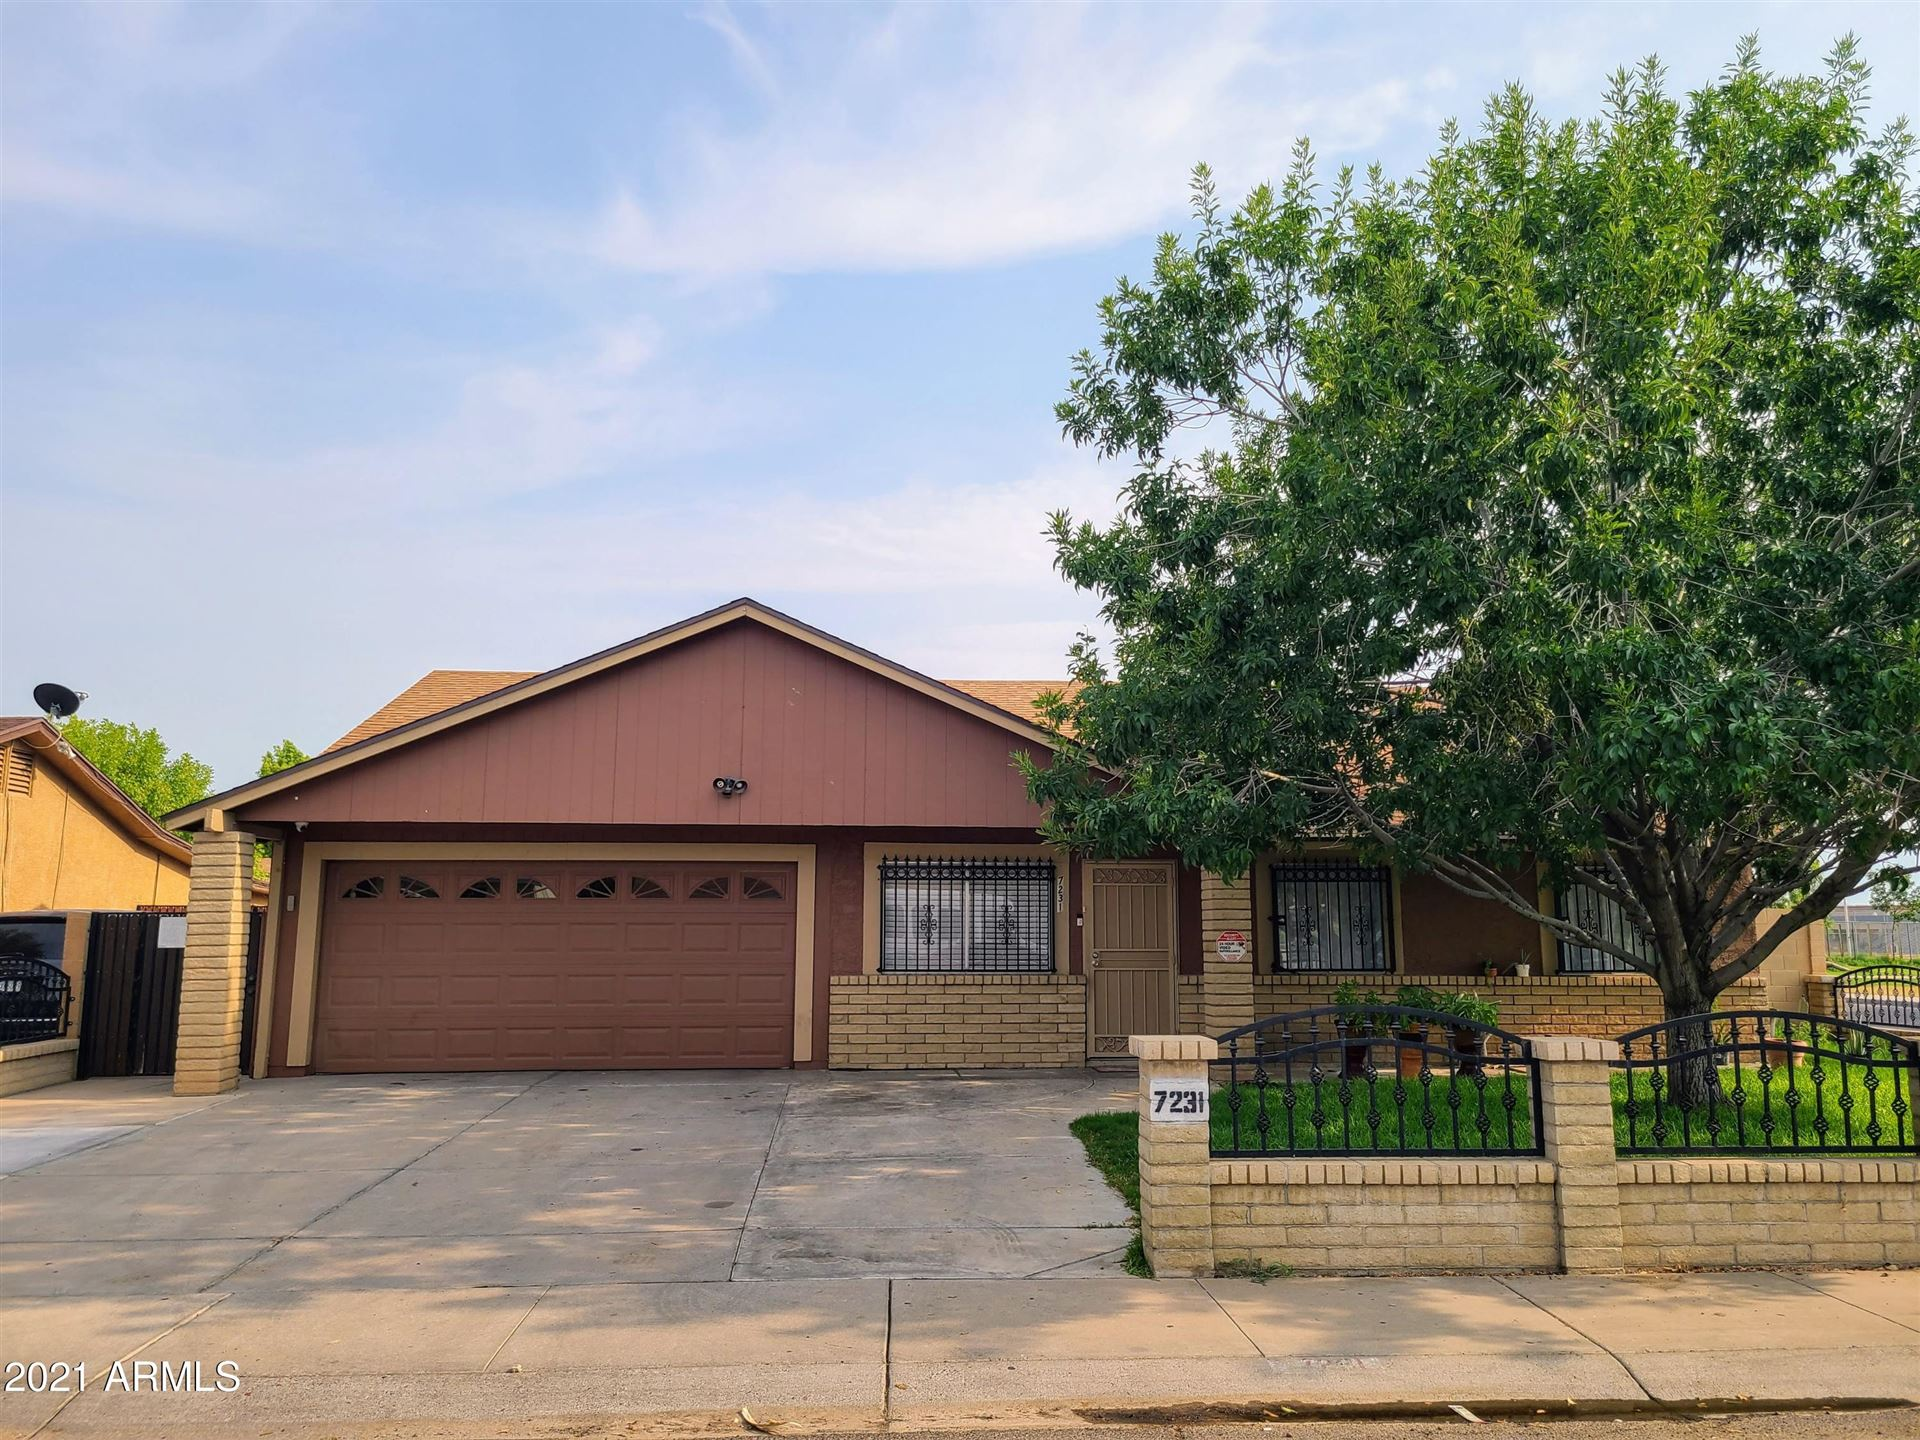 Photo of 7231 W MULBERRY Drive, Phoenix, AZ 85033 (MLS # 6269298)